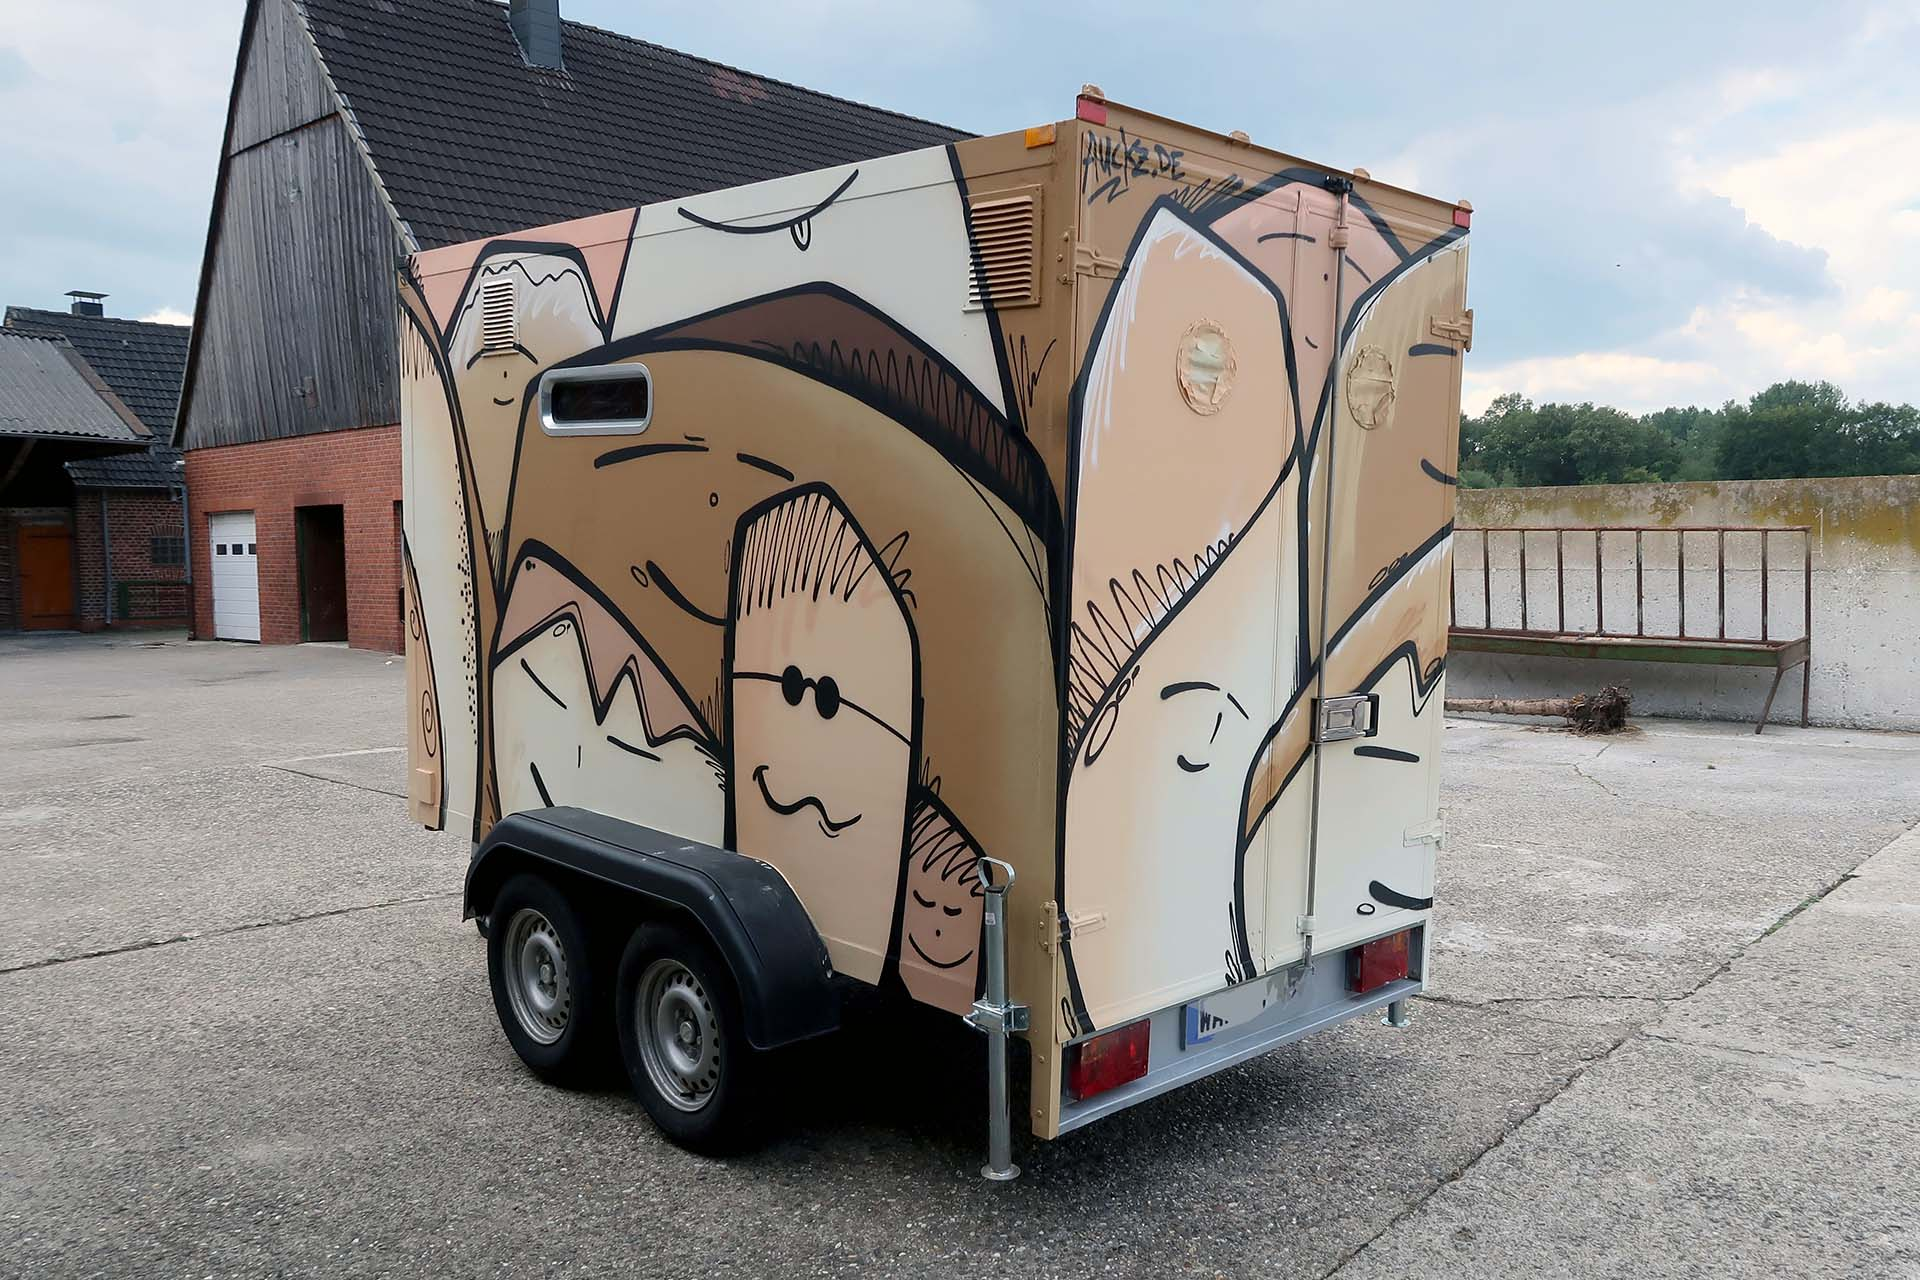 Anhänger, Graffiti, Camping, Auto, Design, Gesichter, Motiv, Lack, Sprayen, Bennet Grüttner, Münster